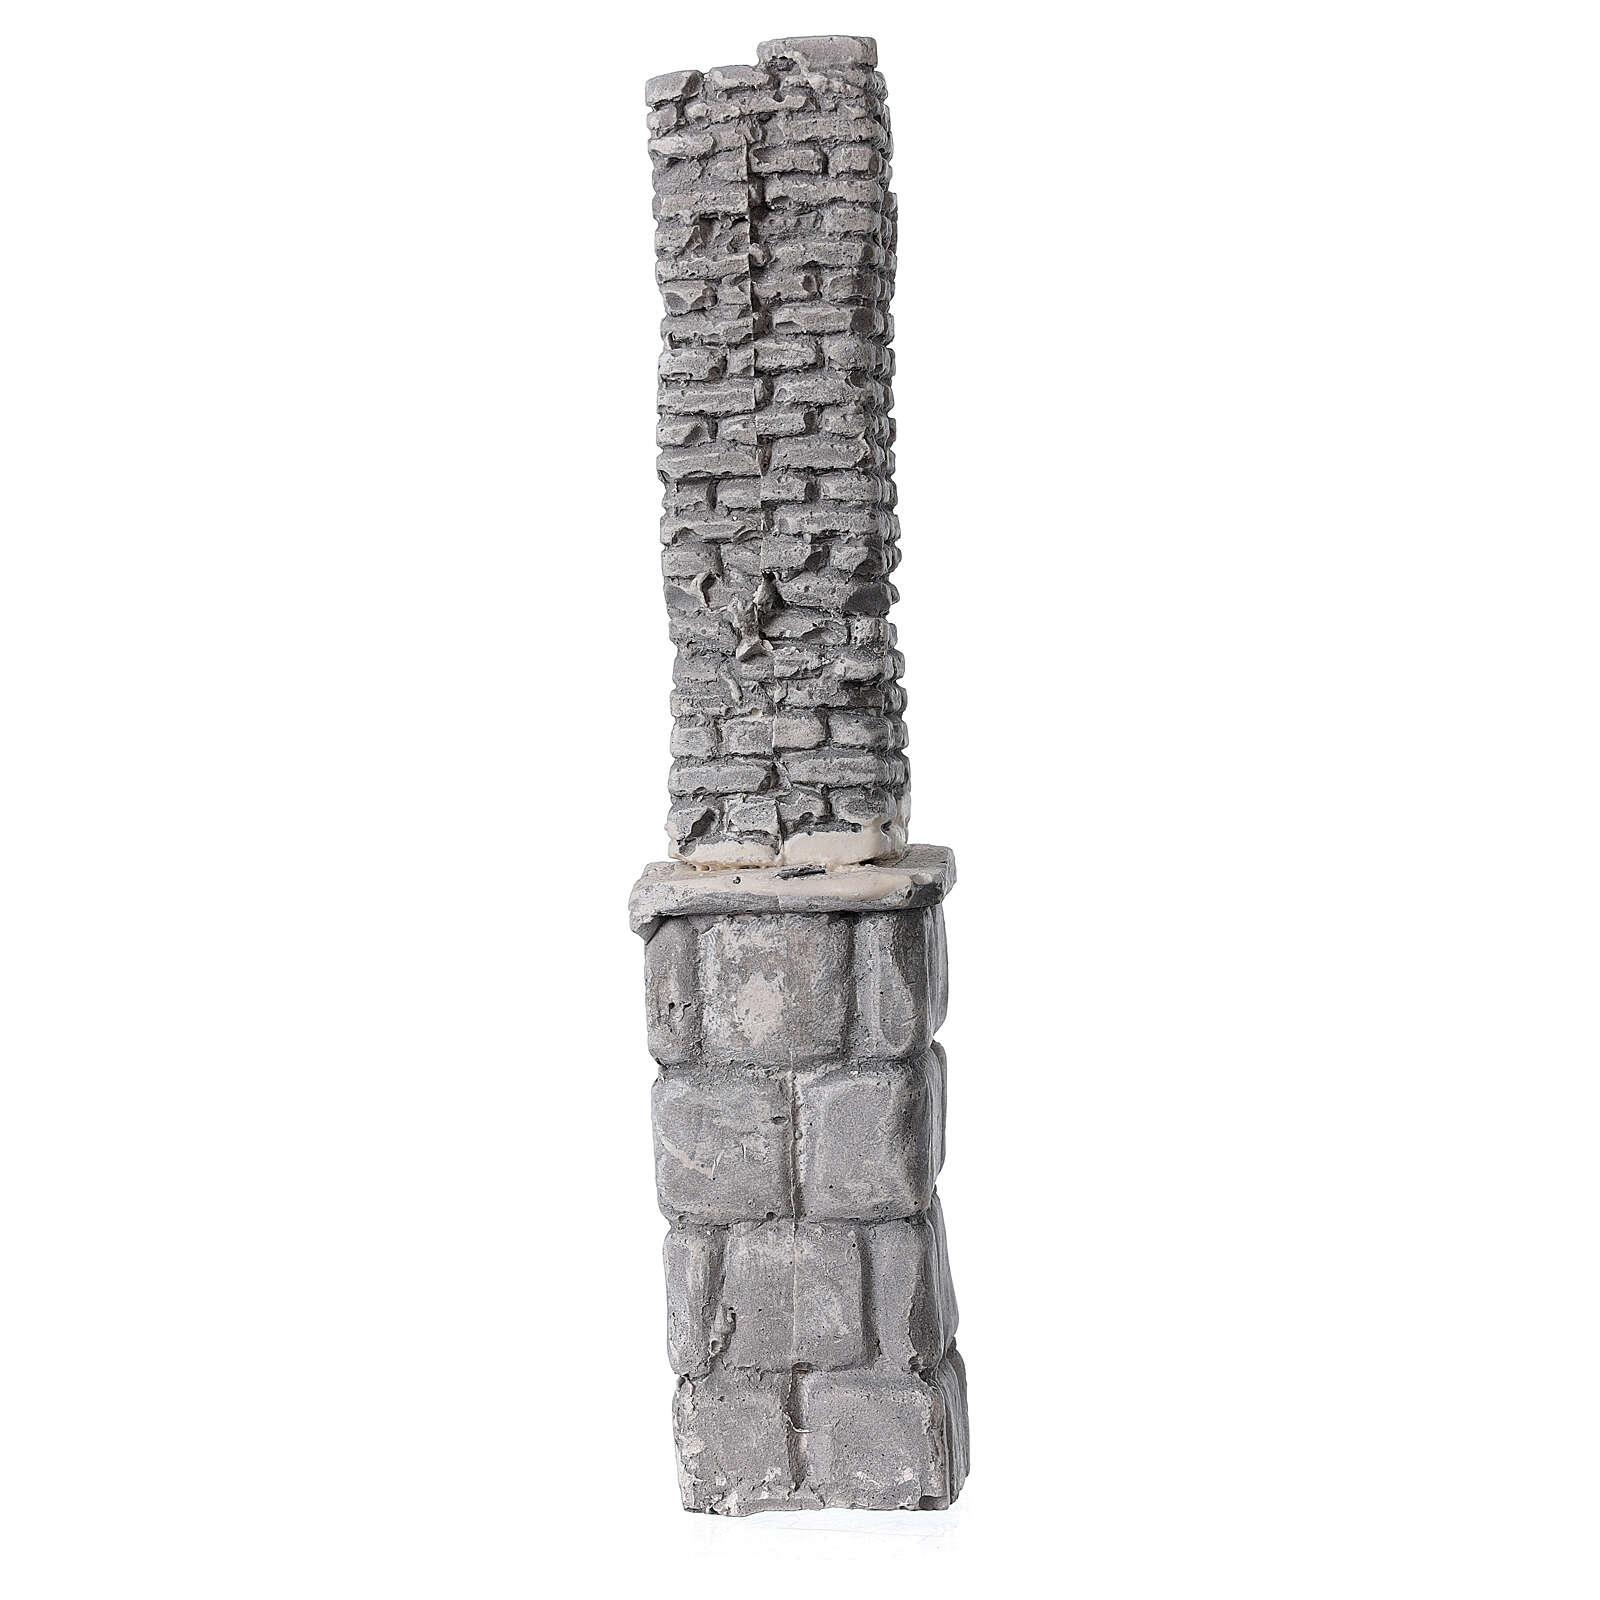 Plaster column for Nativity scene 20x5x5 cm 4